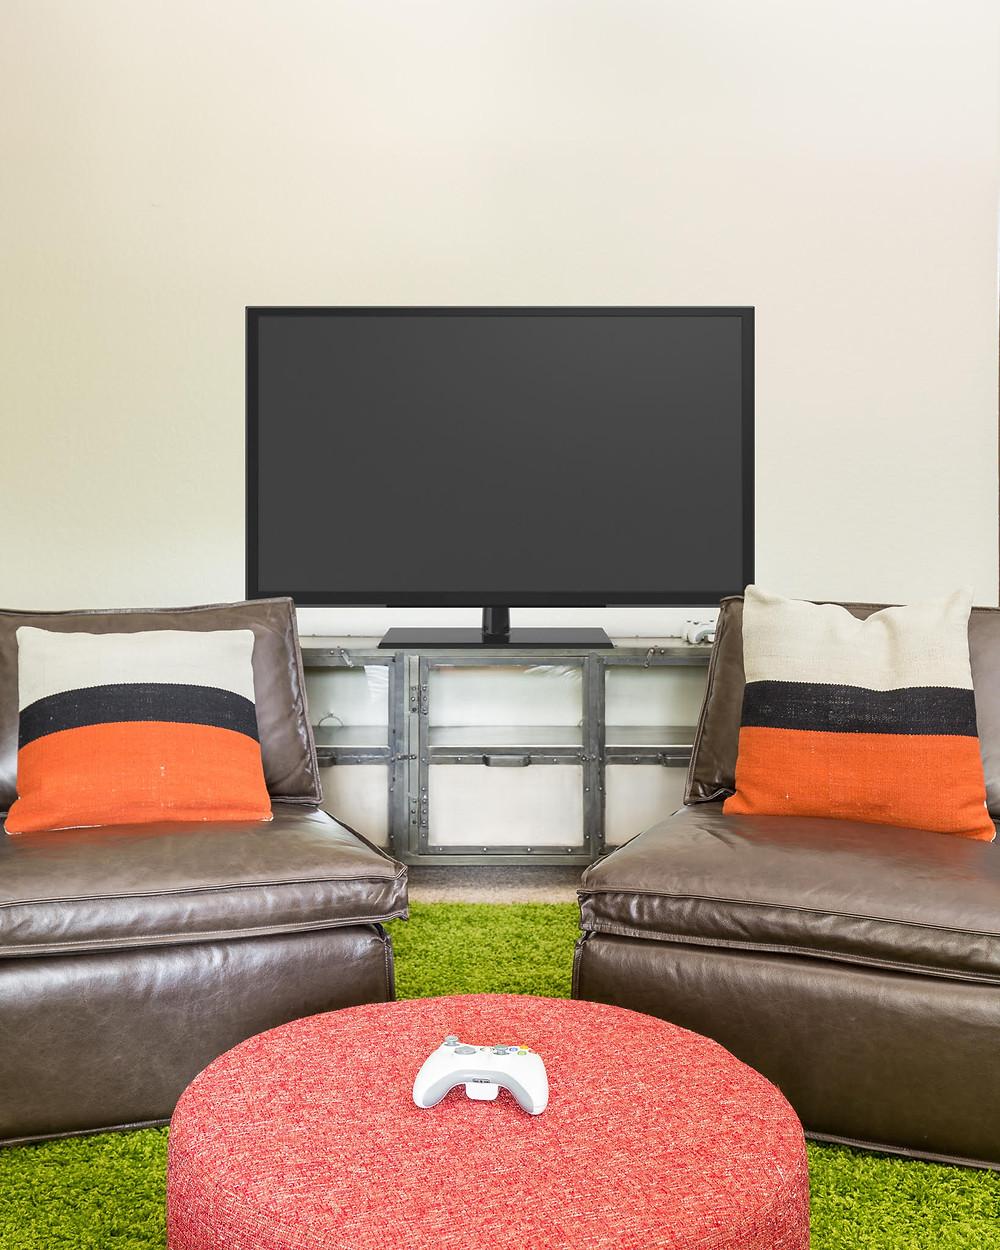 TV gaming area in boys' bedroom